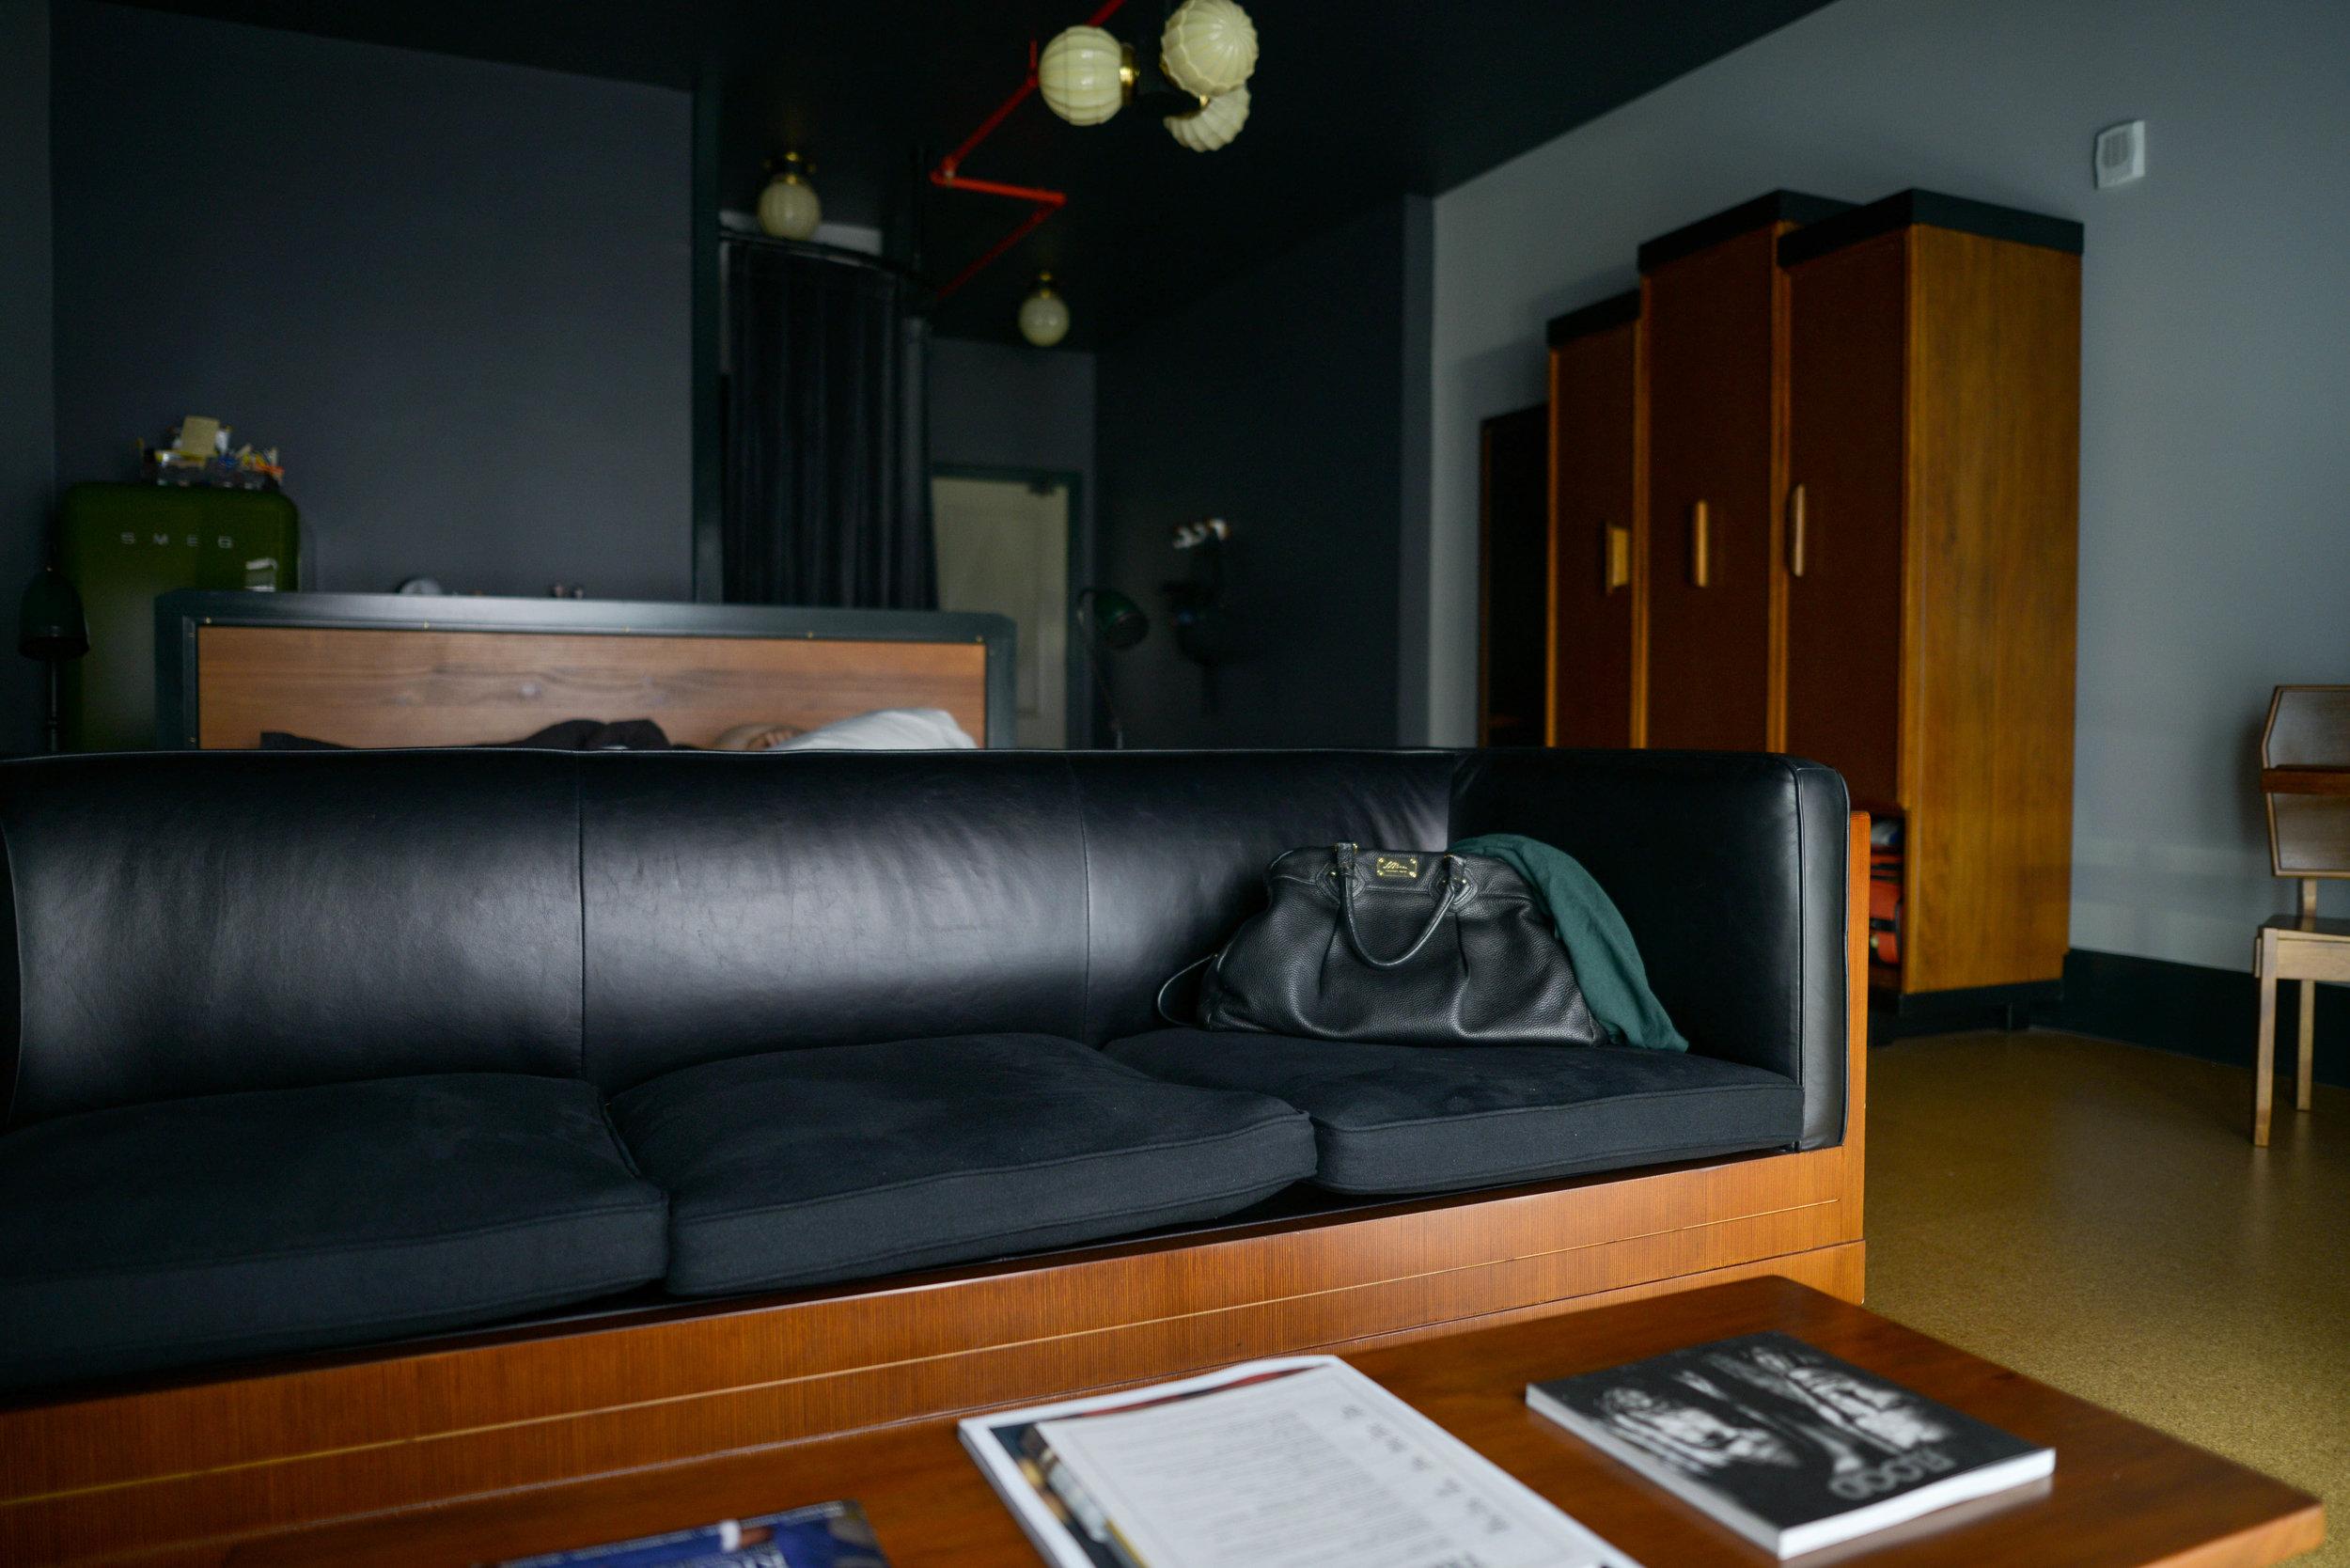 Our Hotel Room | Photo: Lauren L Caron © 2016